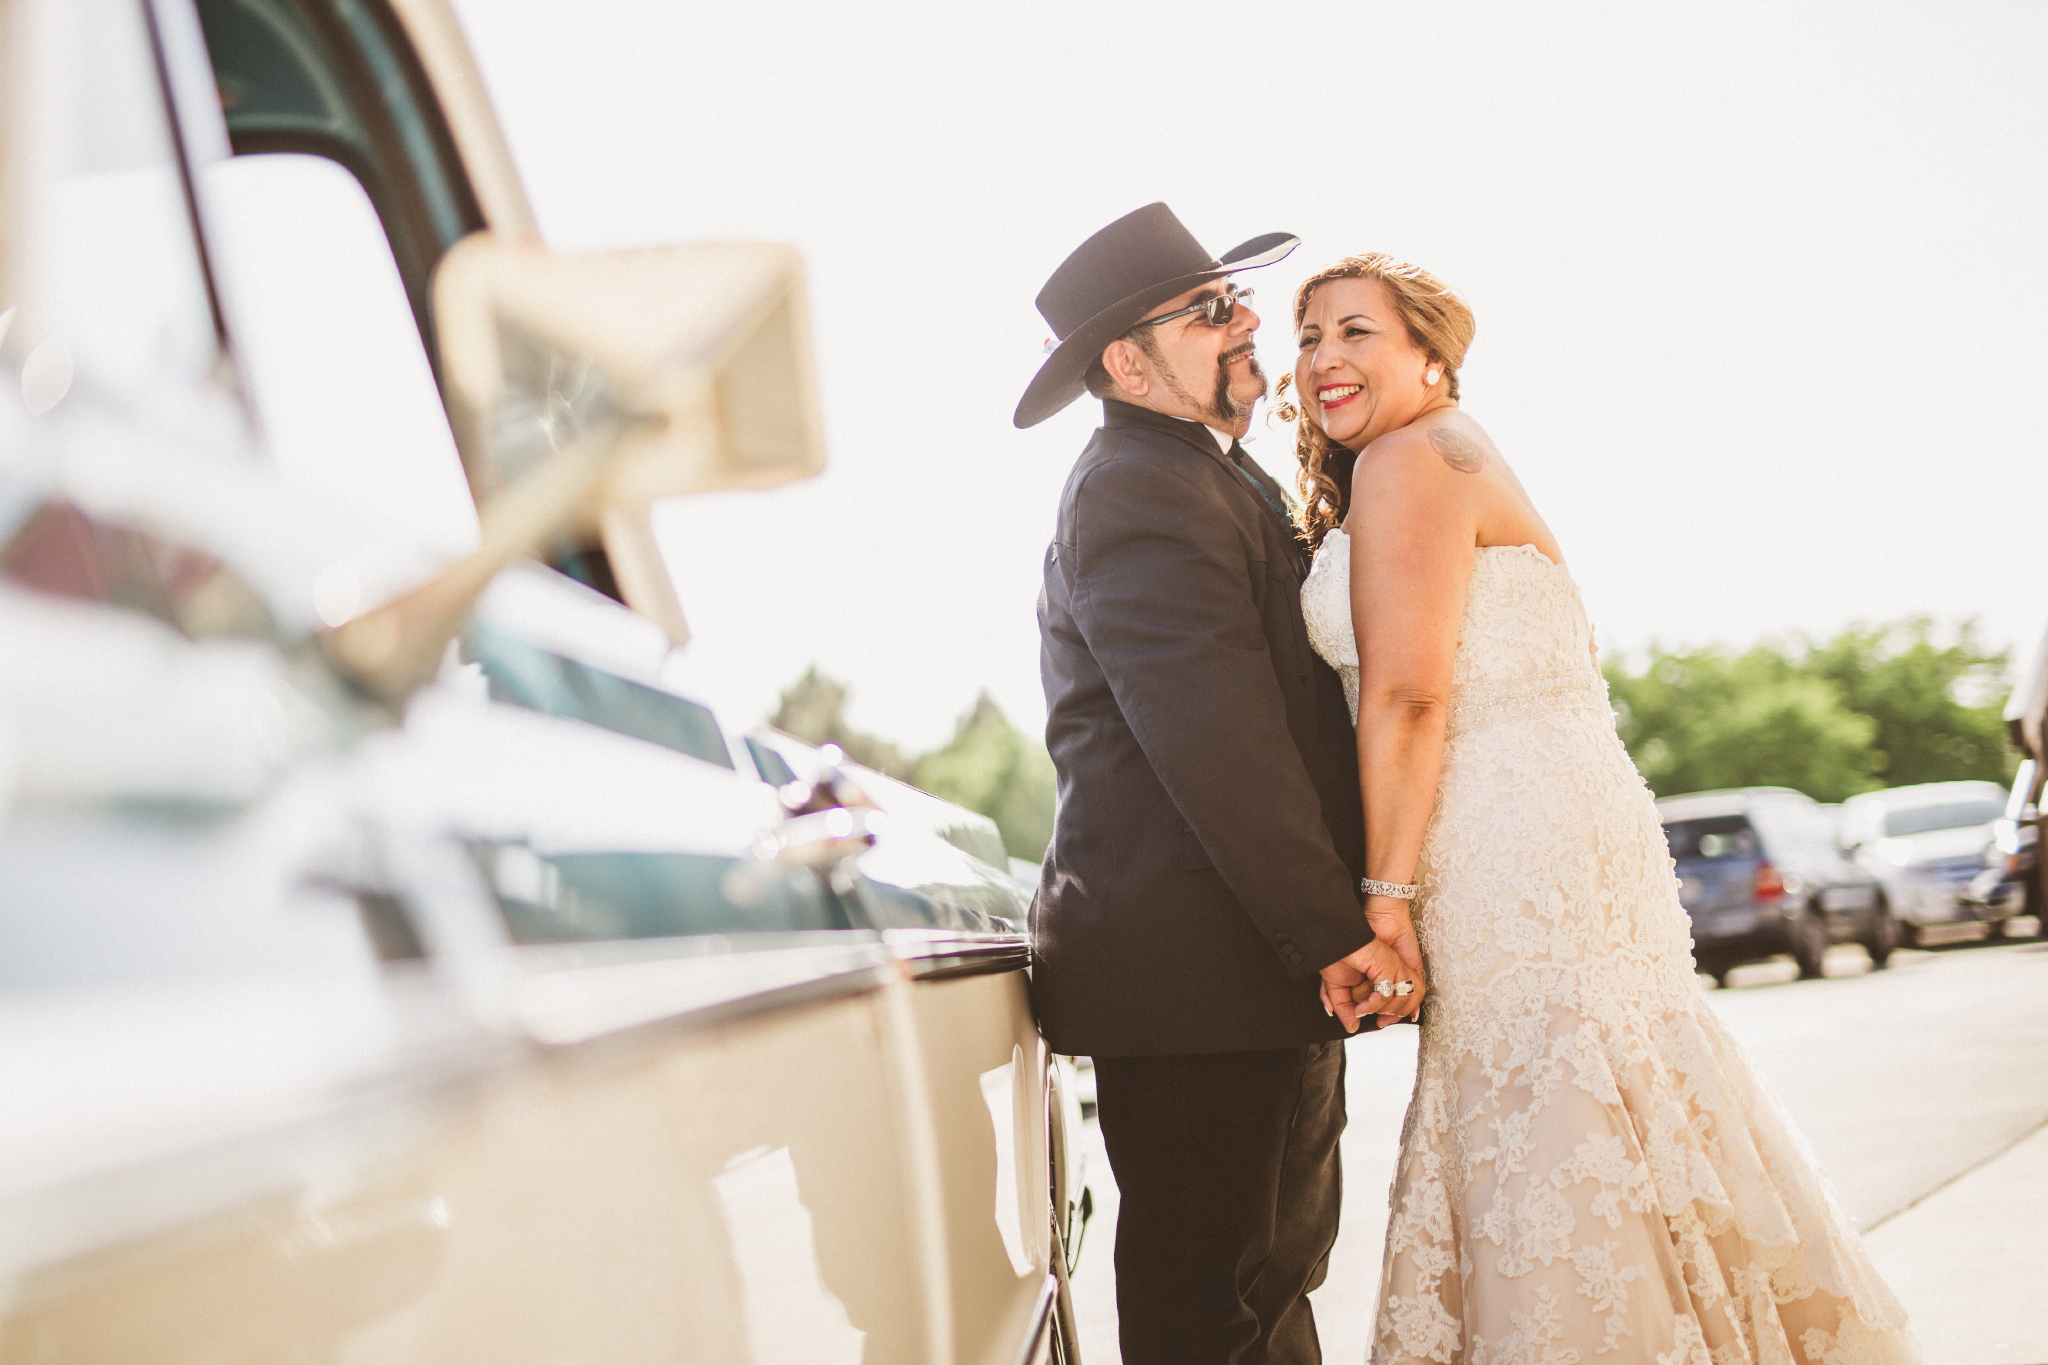 MANA + CHAVA wedding